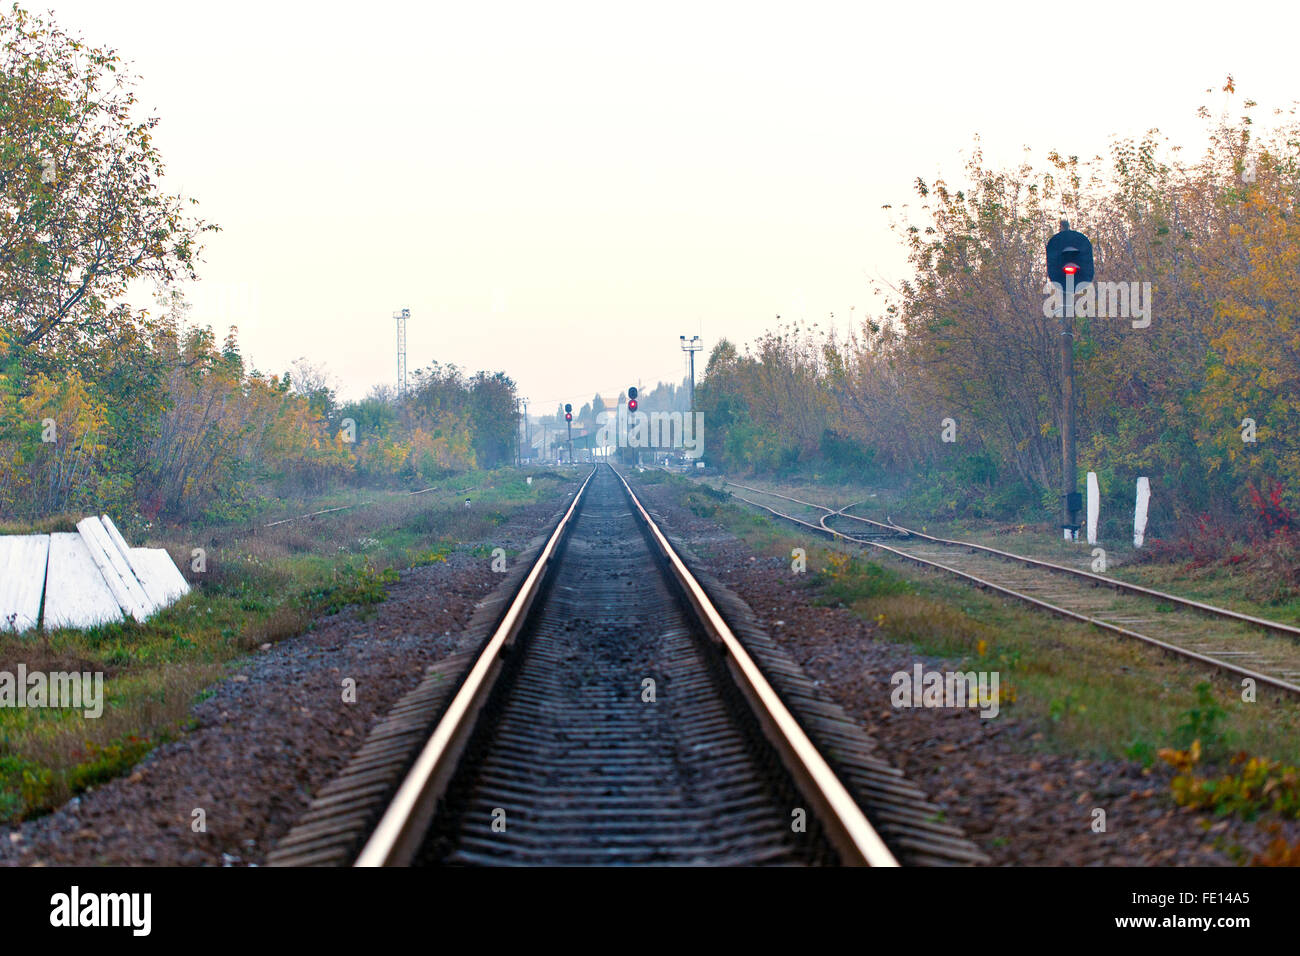 railroad tracks Transportation day leaving for horizon - Stock Image